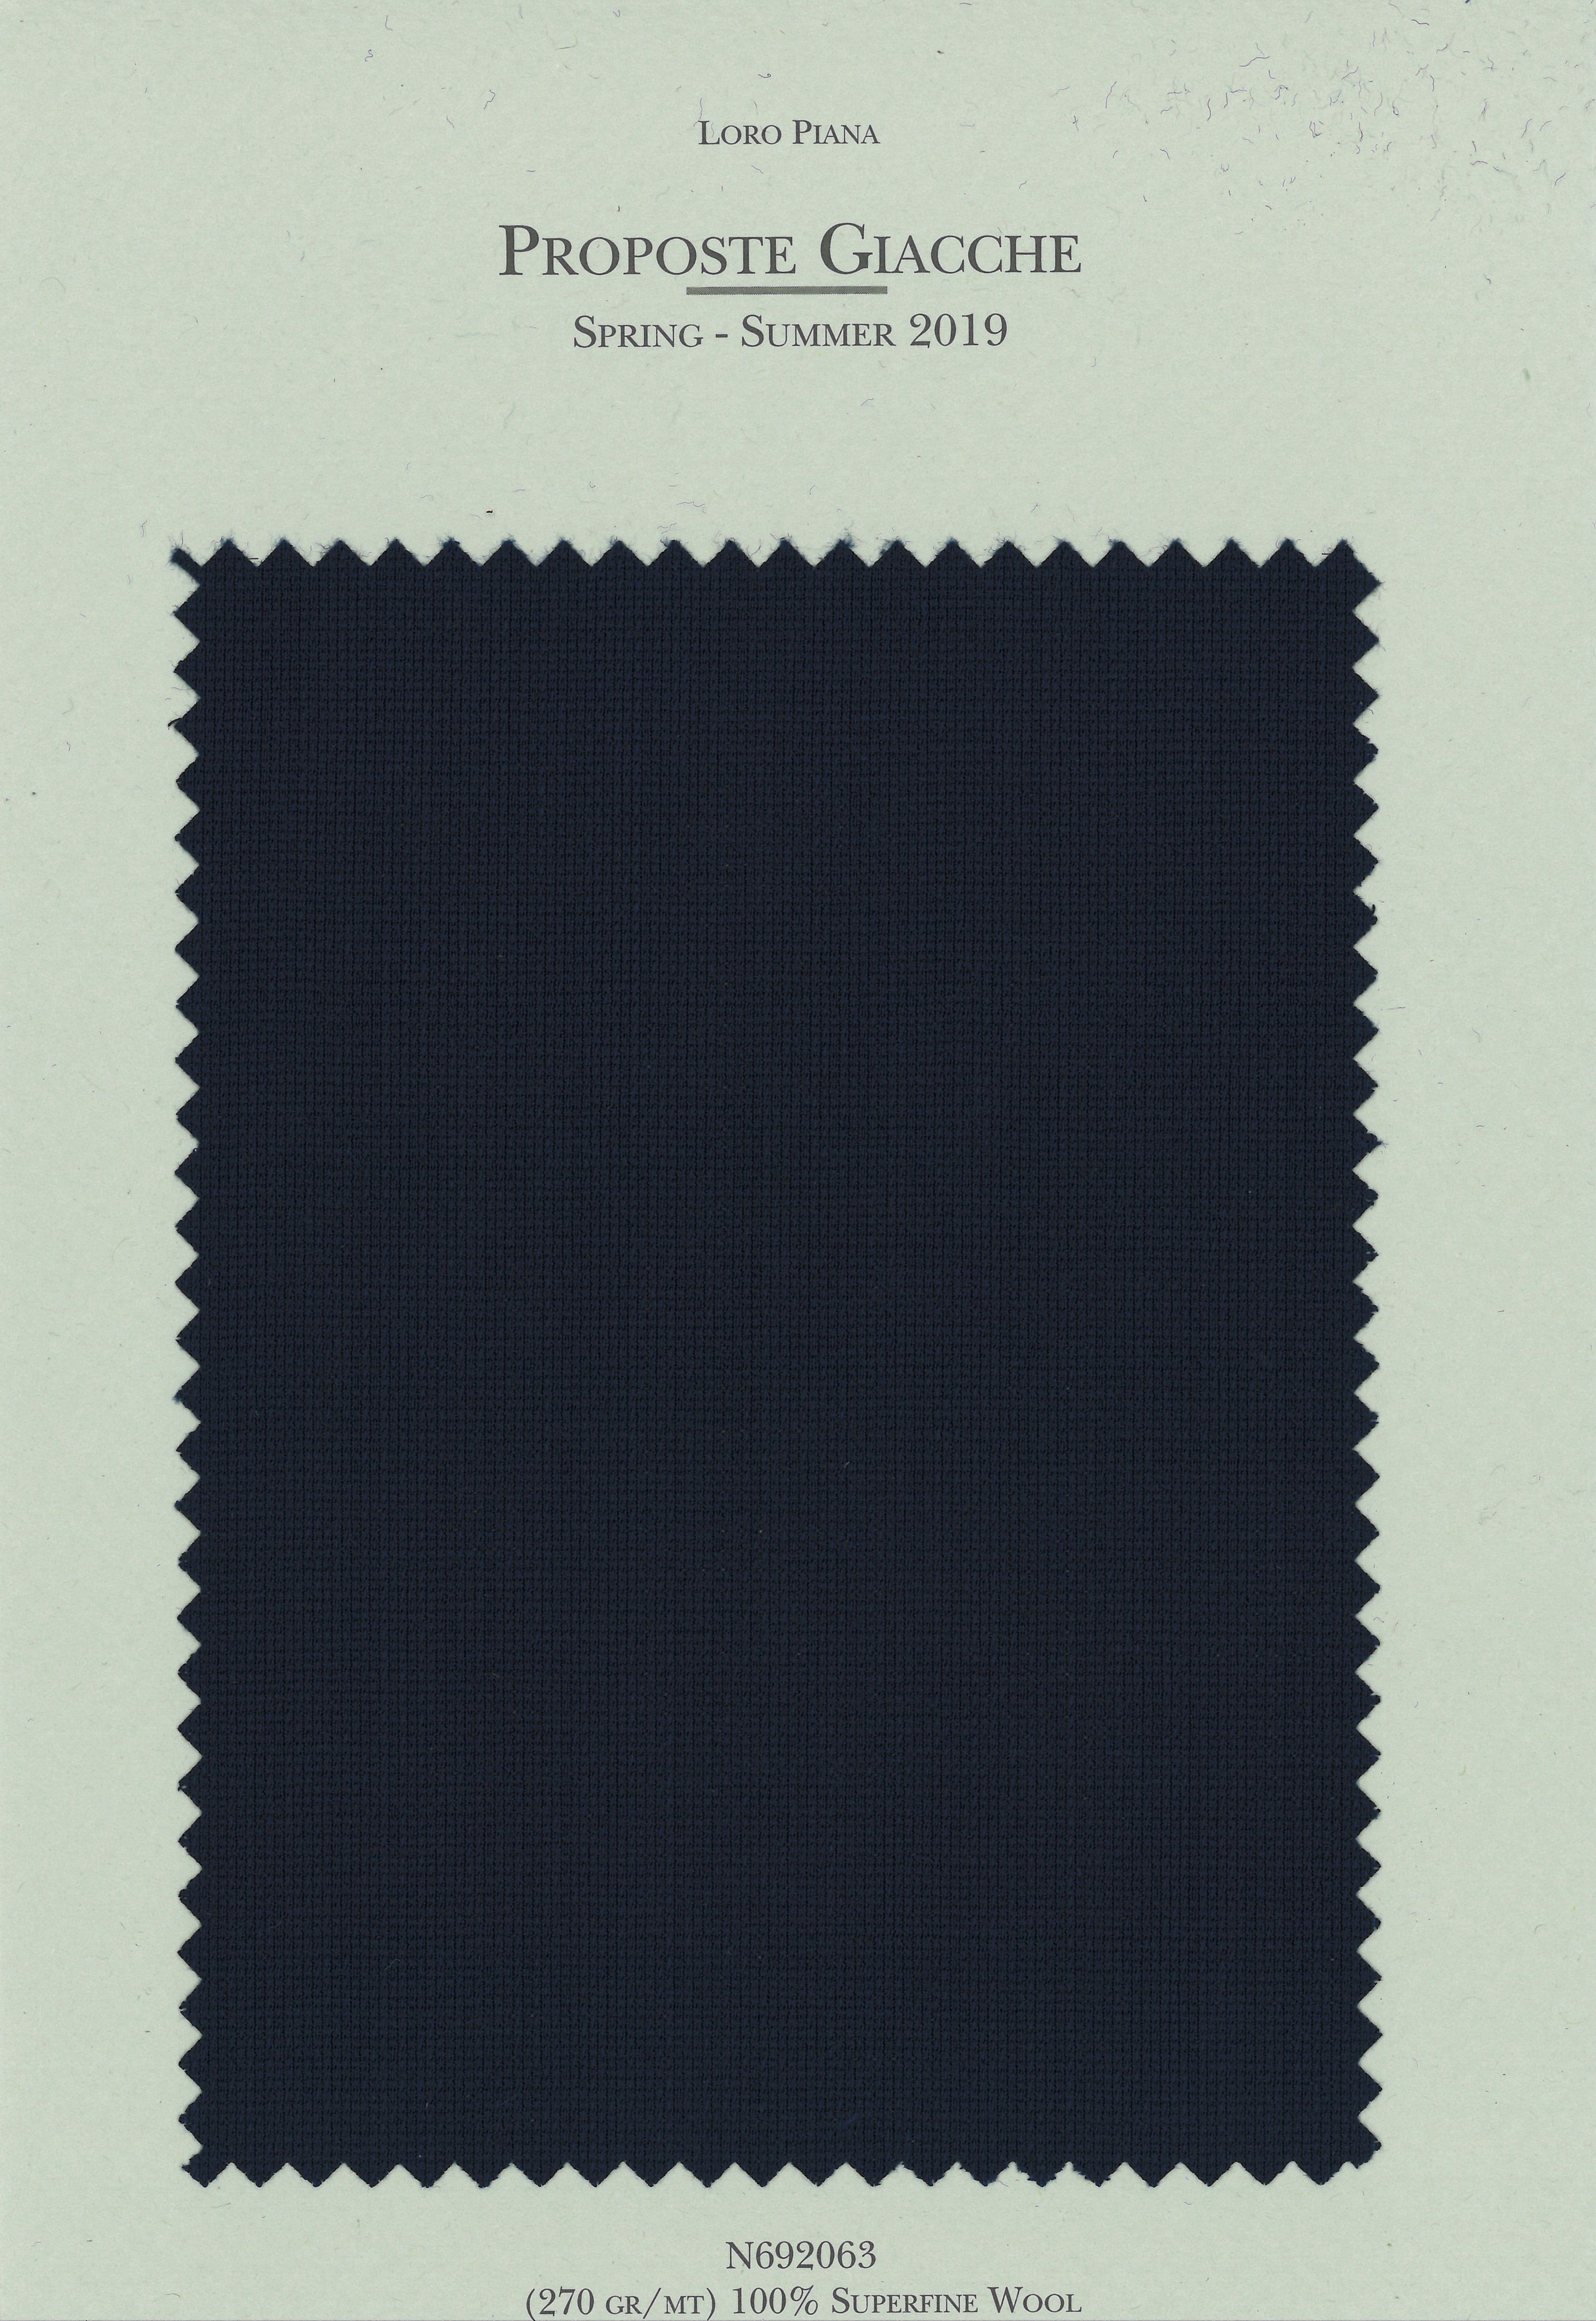 N692063